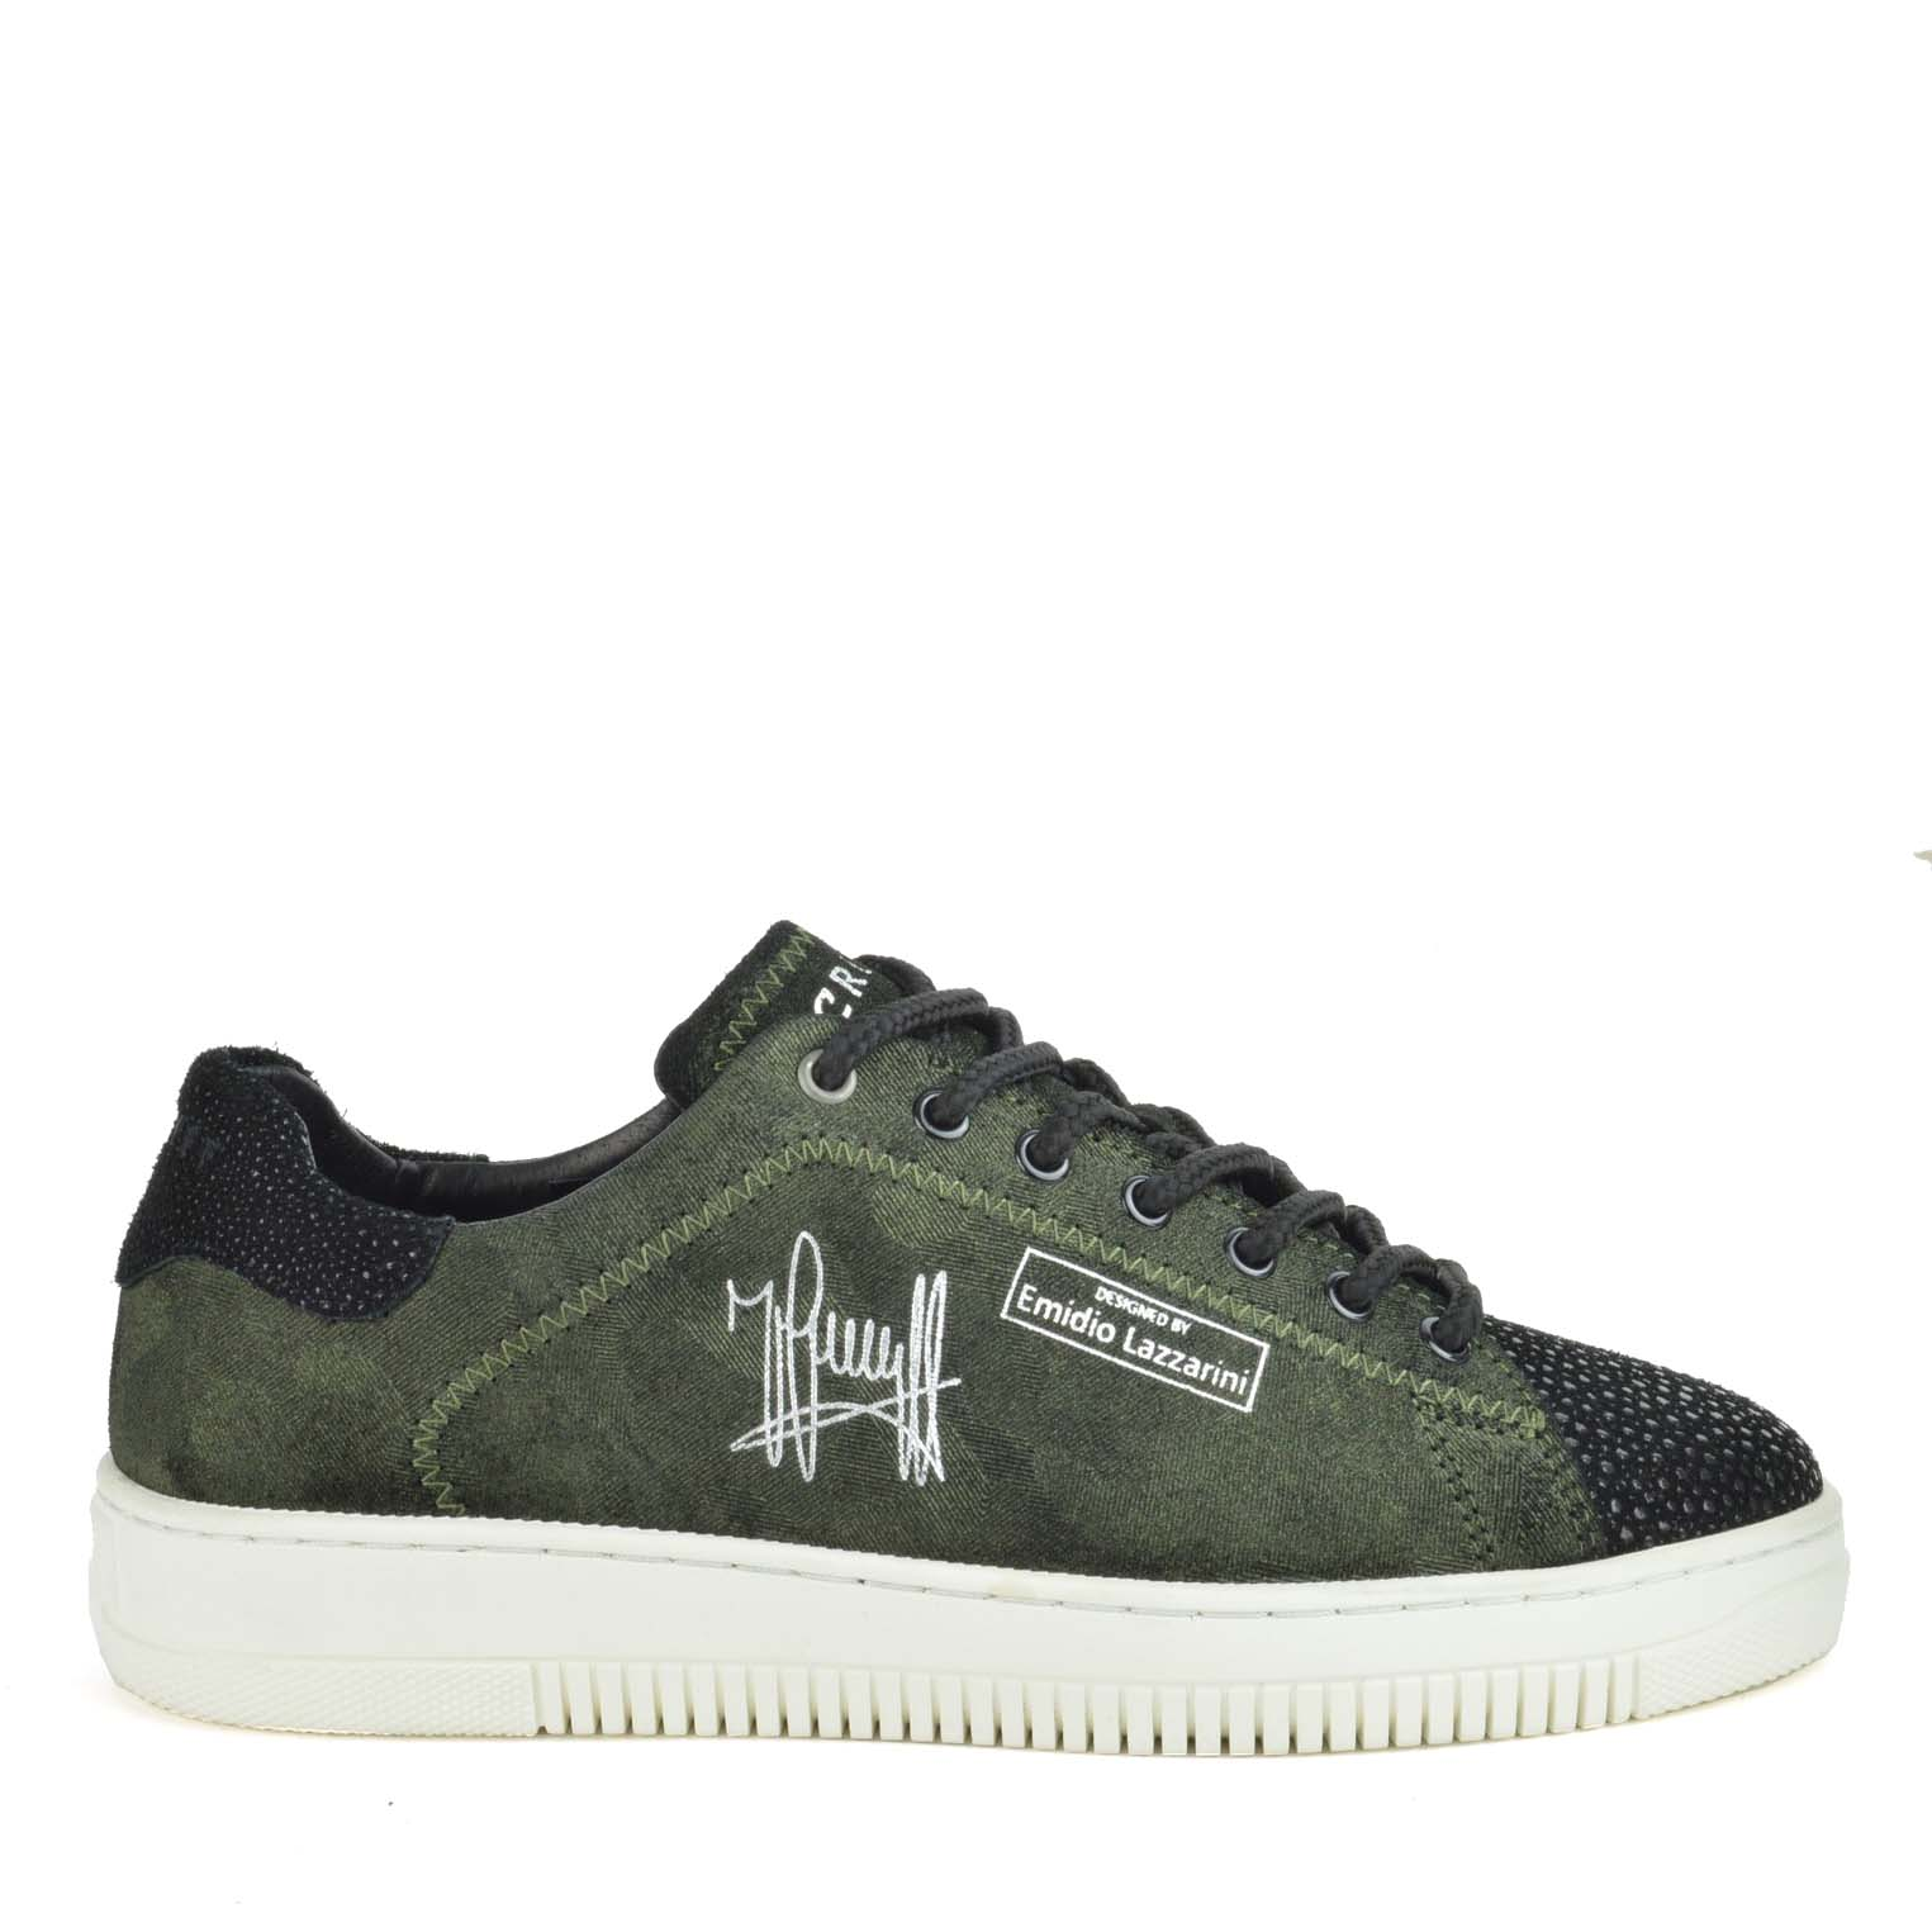 0b612251cf8 Cruyff Joan CC6350183340 / 3350 order online   Oxener Shoes